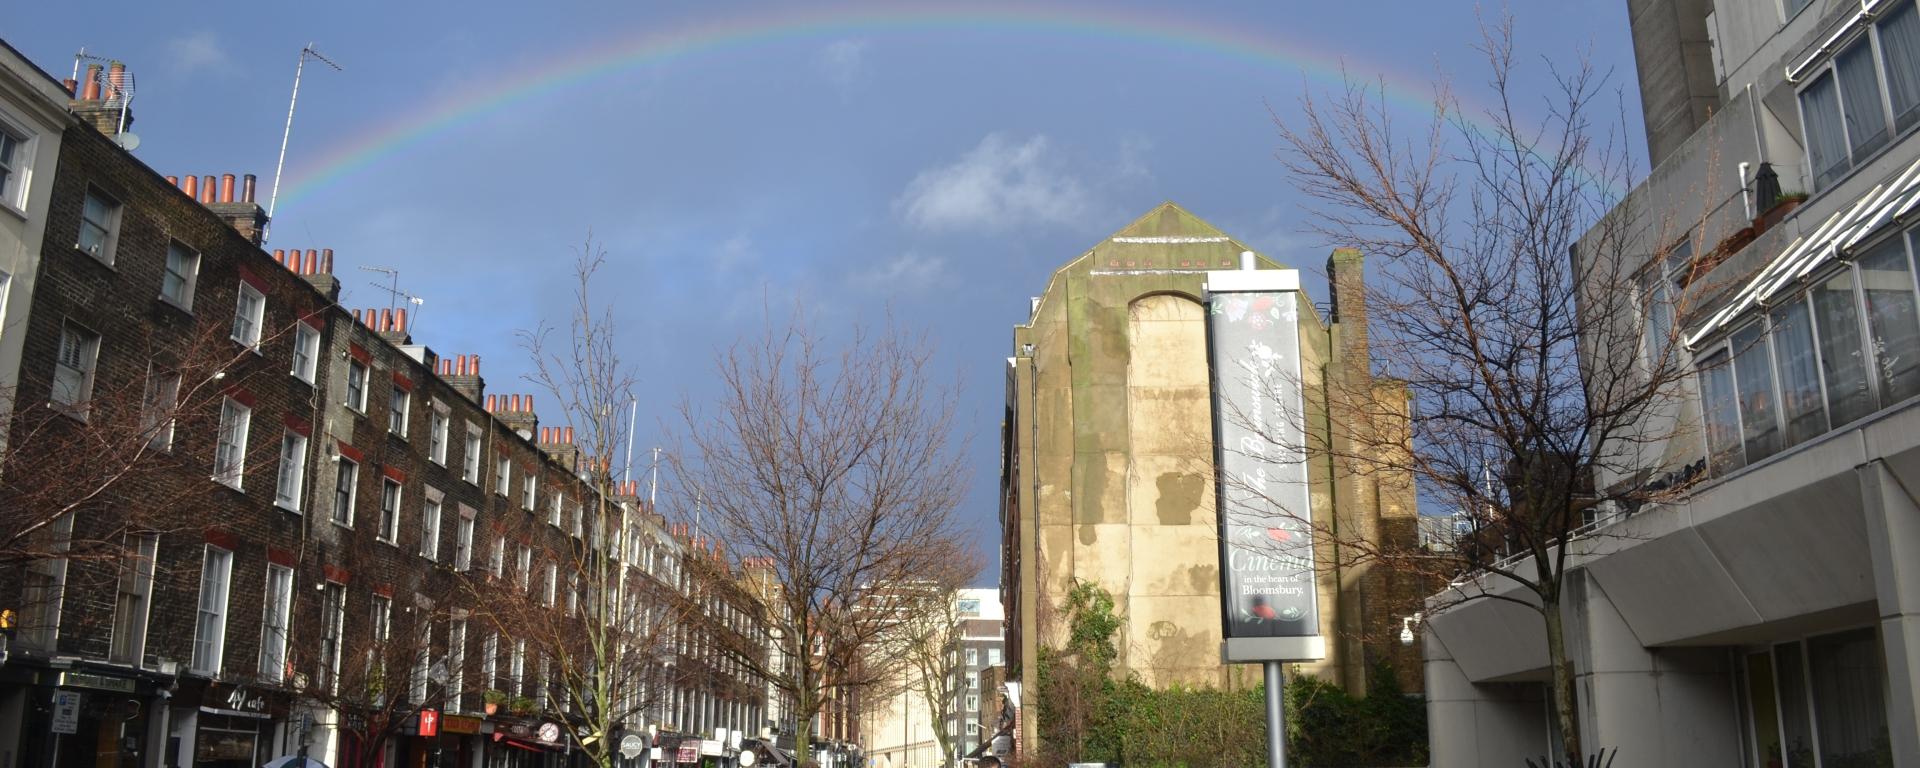 Rainbow over Marchmont Street, Bloomsbury